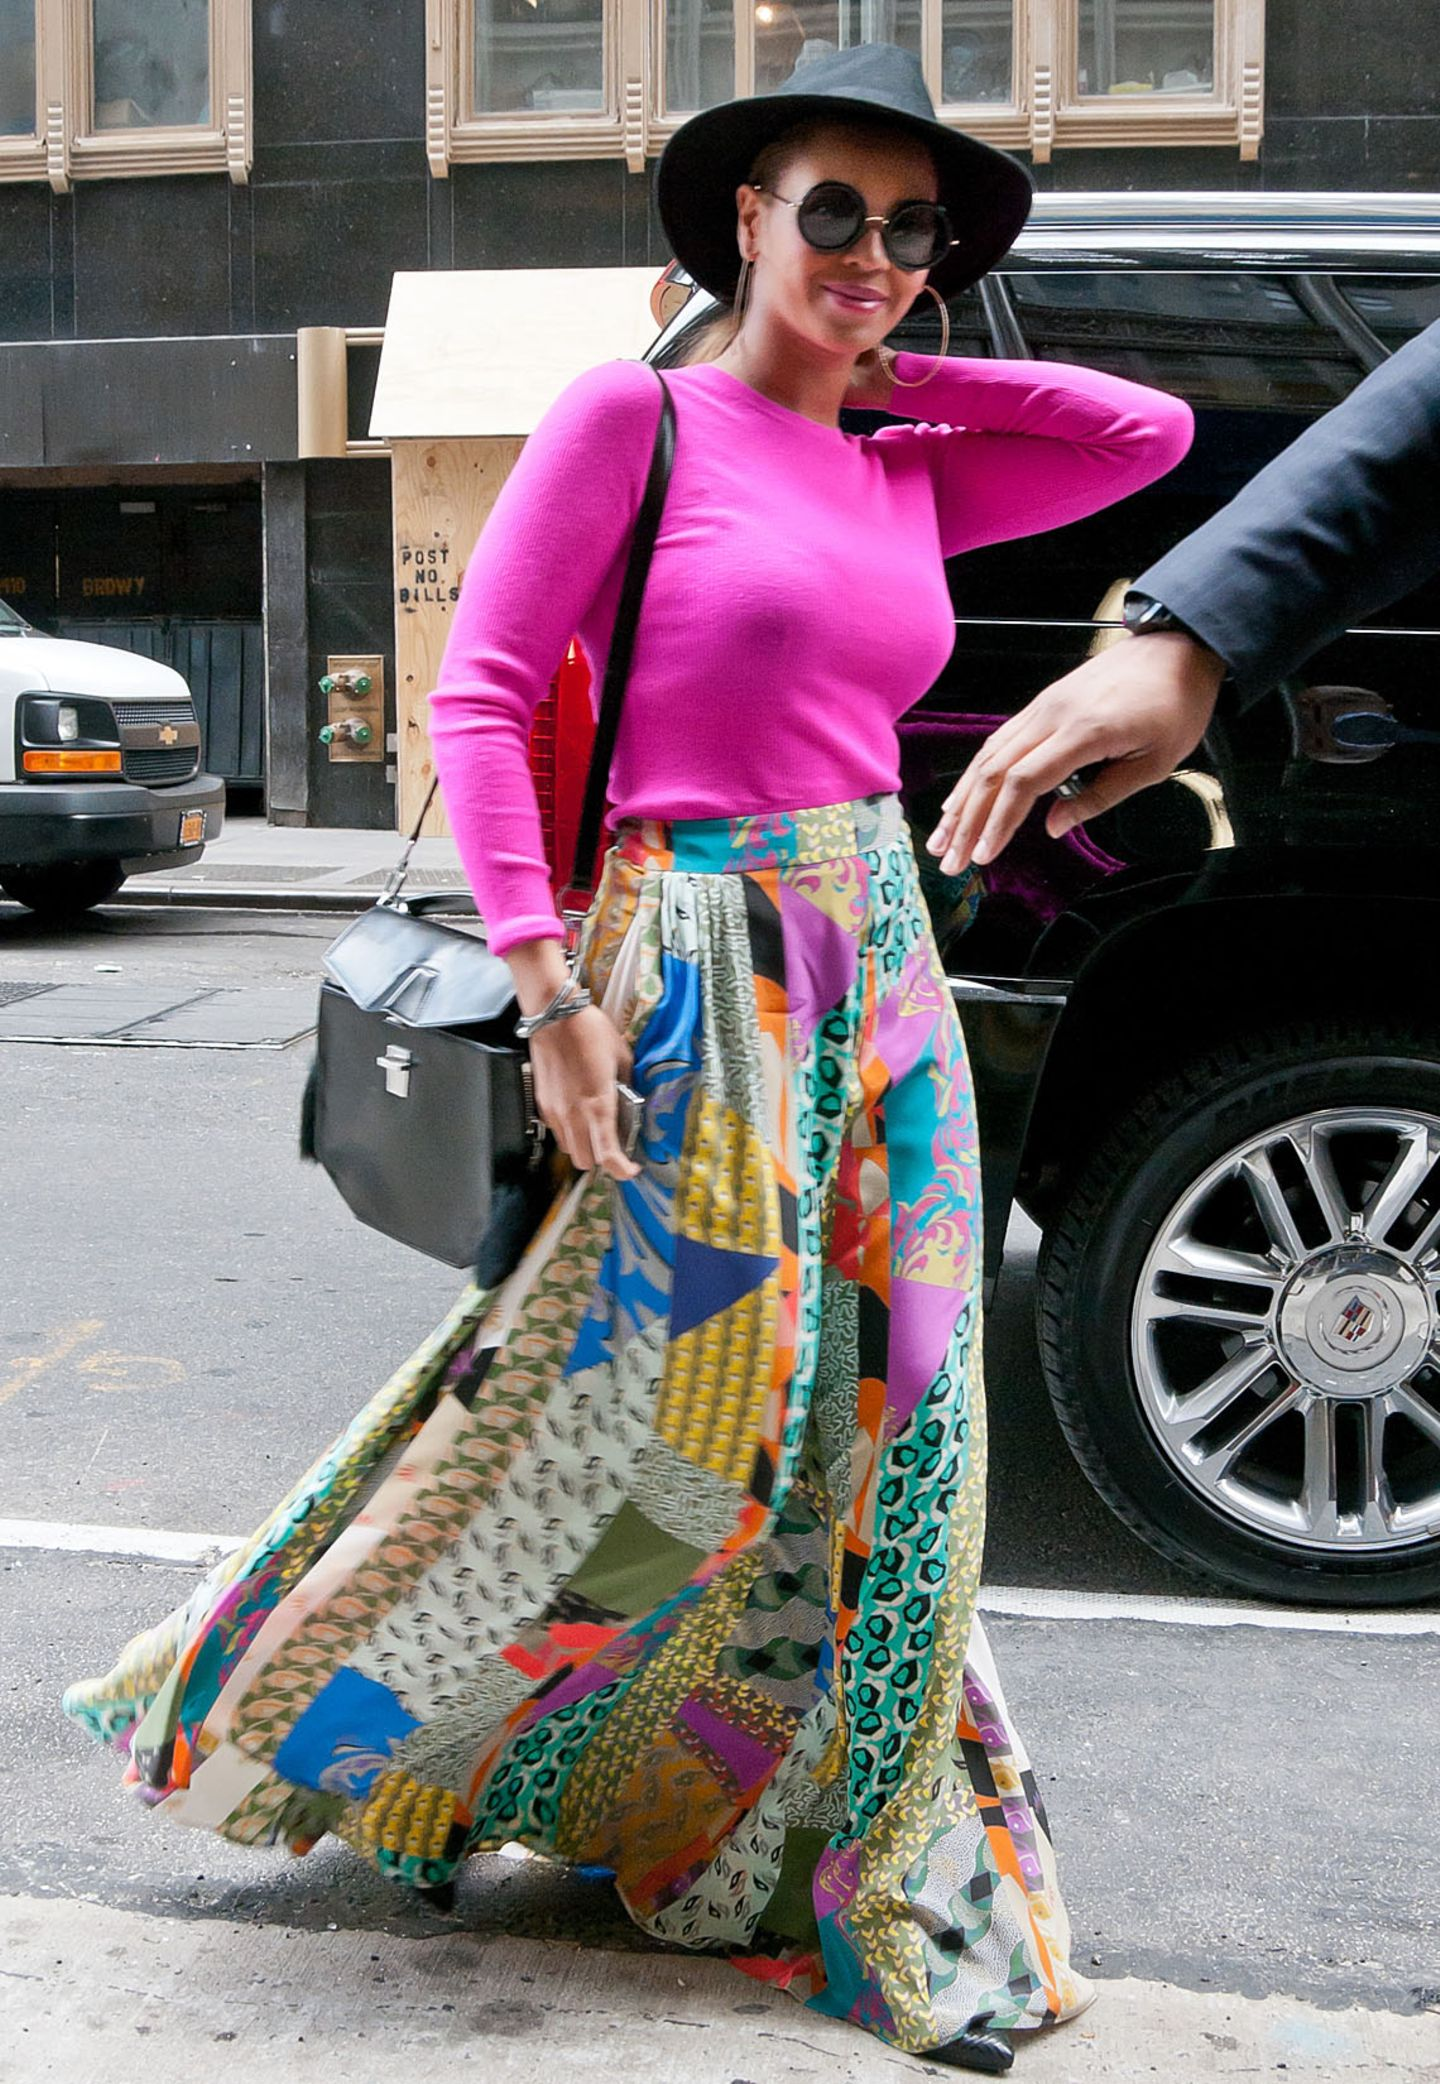 Neonfarben: Beyoncé trägt auch im Alltag gerne knallige Farben.